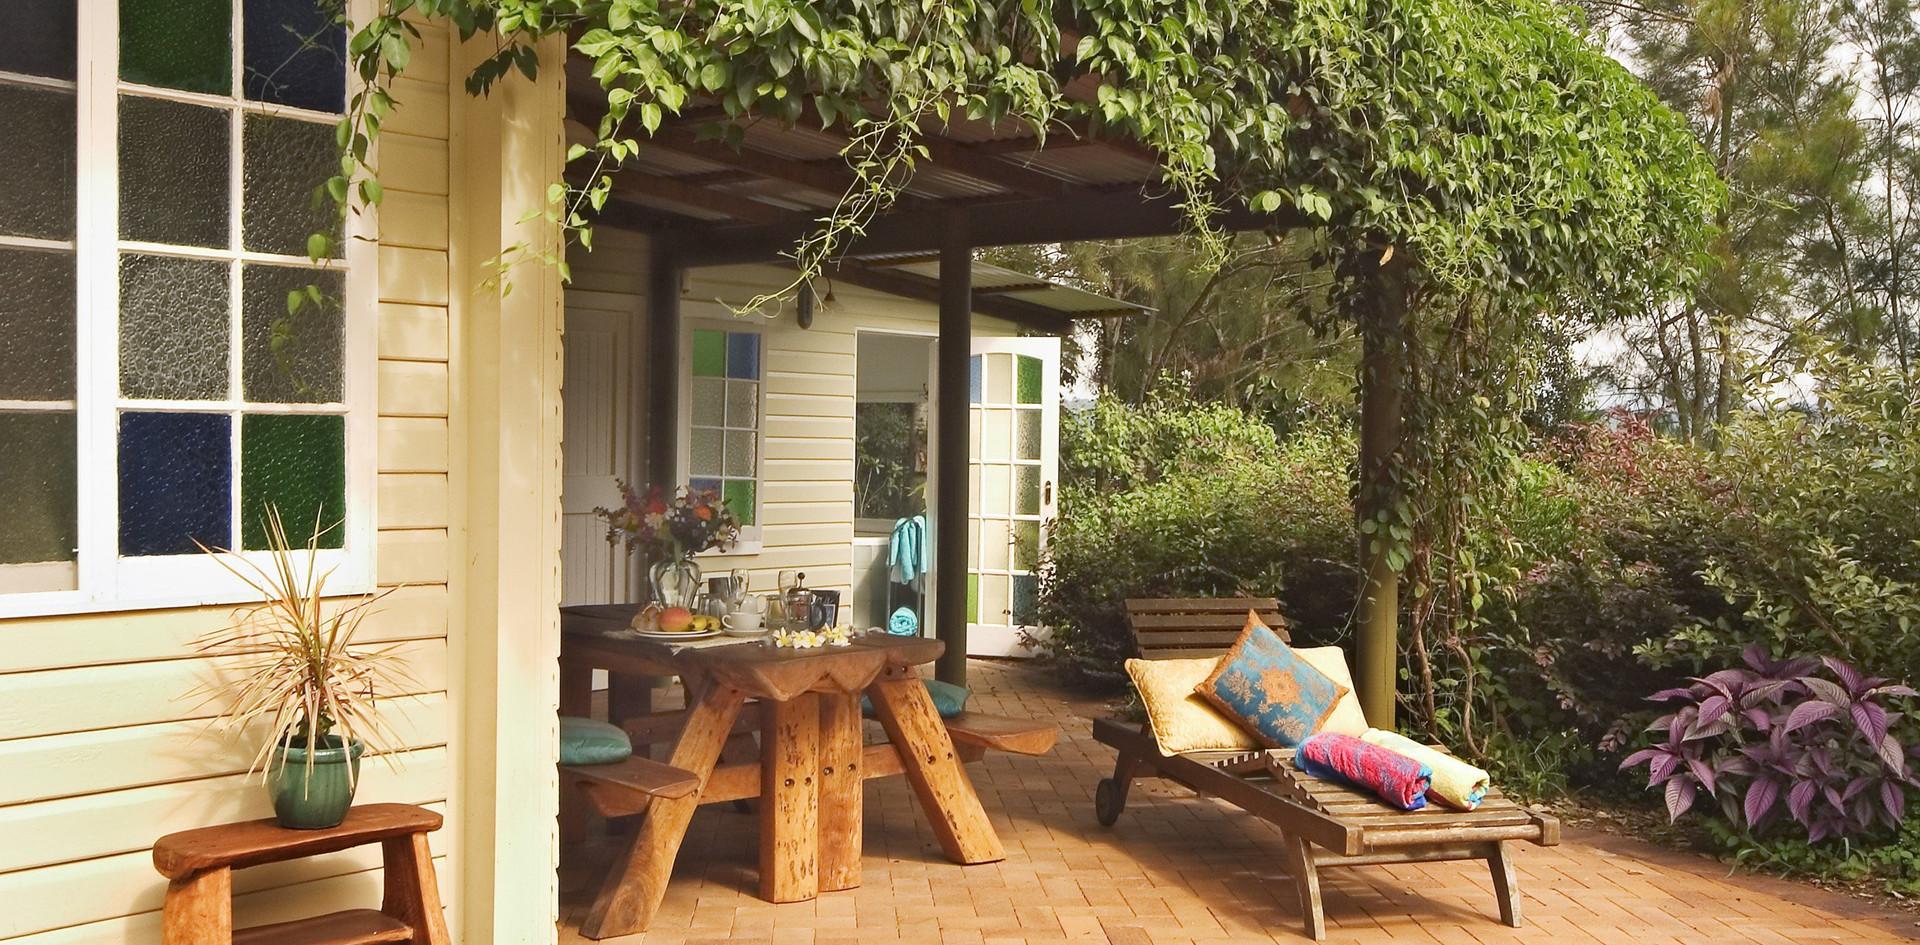 Forest Retreat Cabin - Summerhills Retre